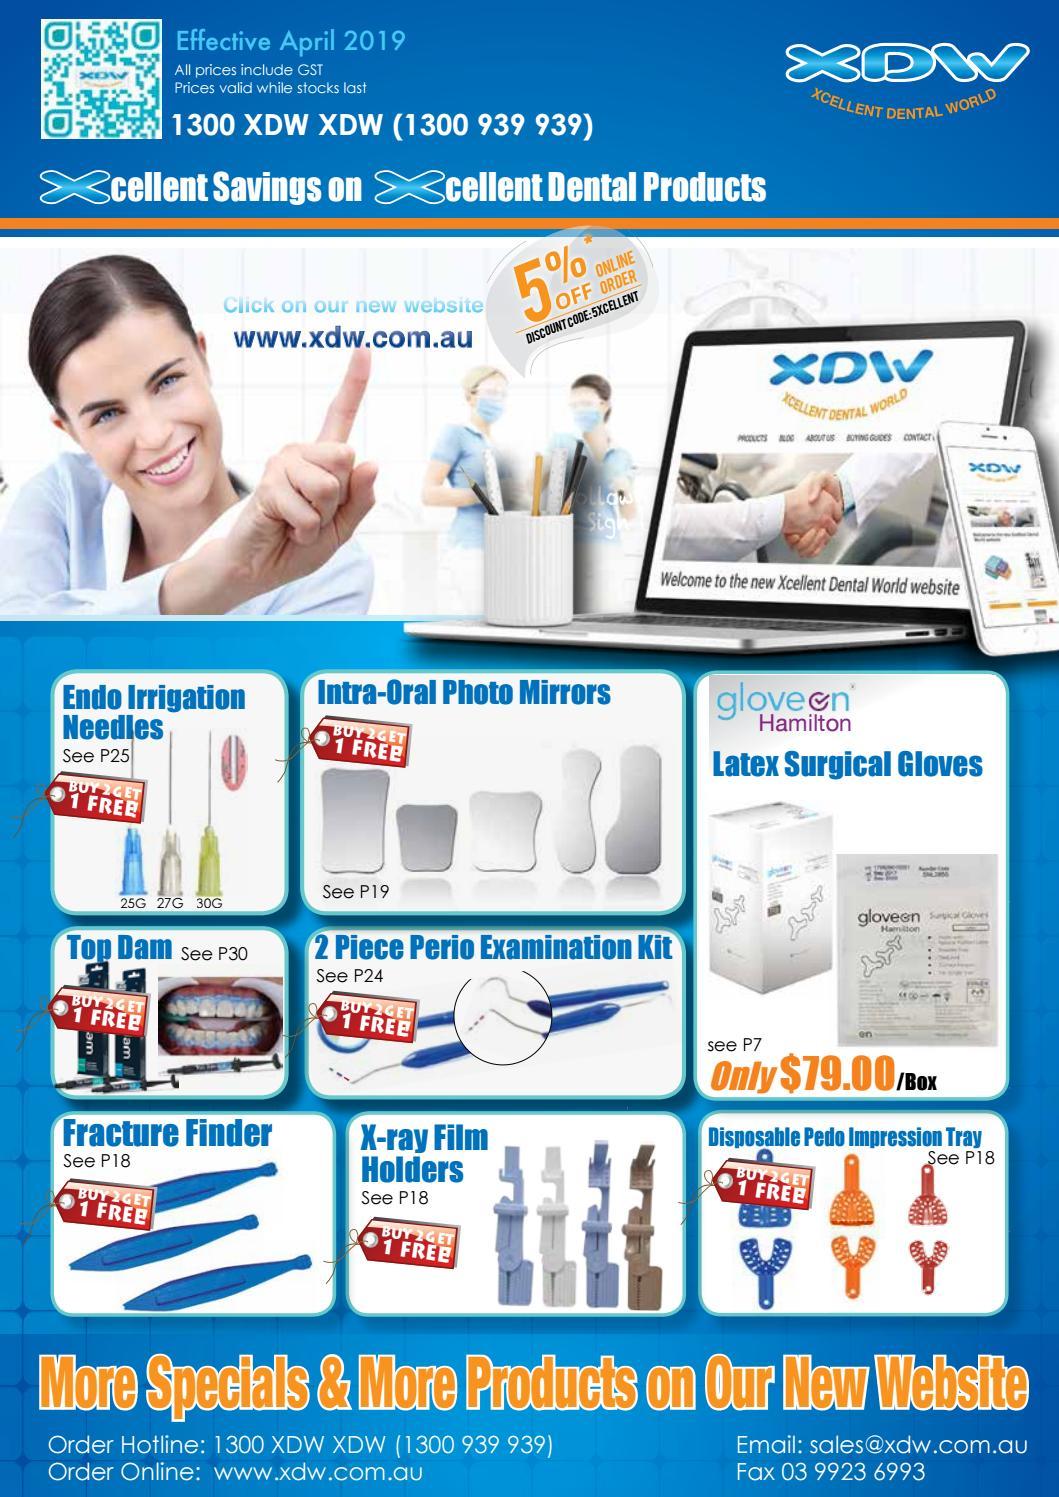 Box Disposable Dental Chair Headrest Cover Plastic Transparent Dental Supplies Oral Hygiene 250 Pcs